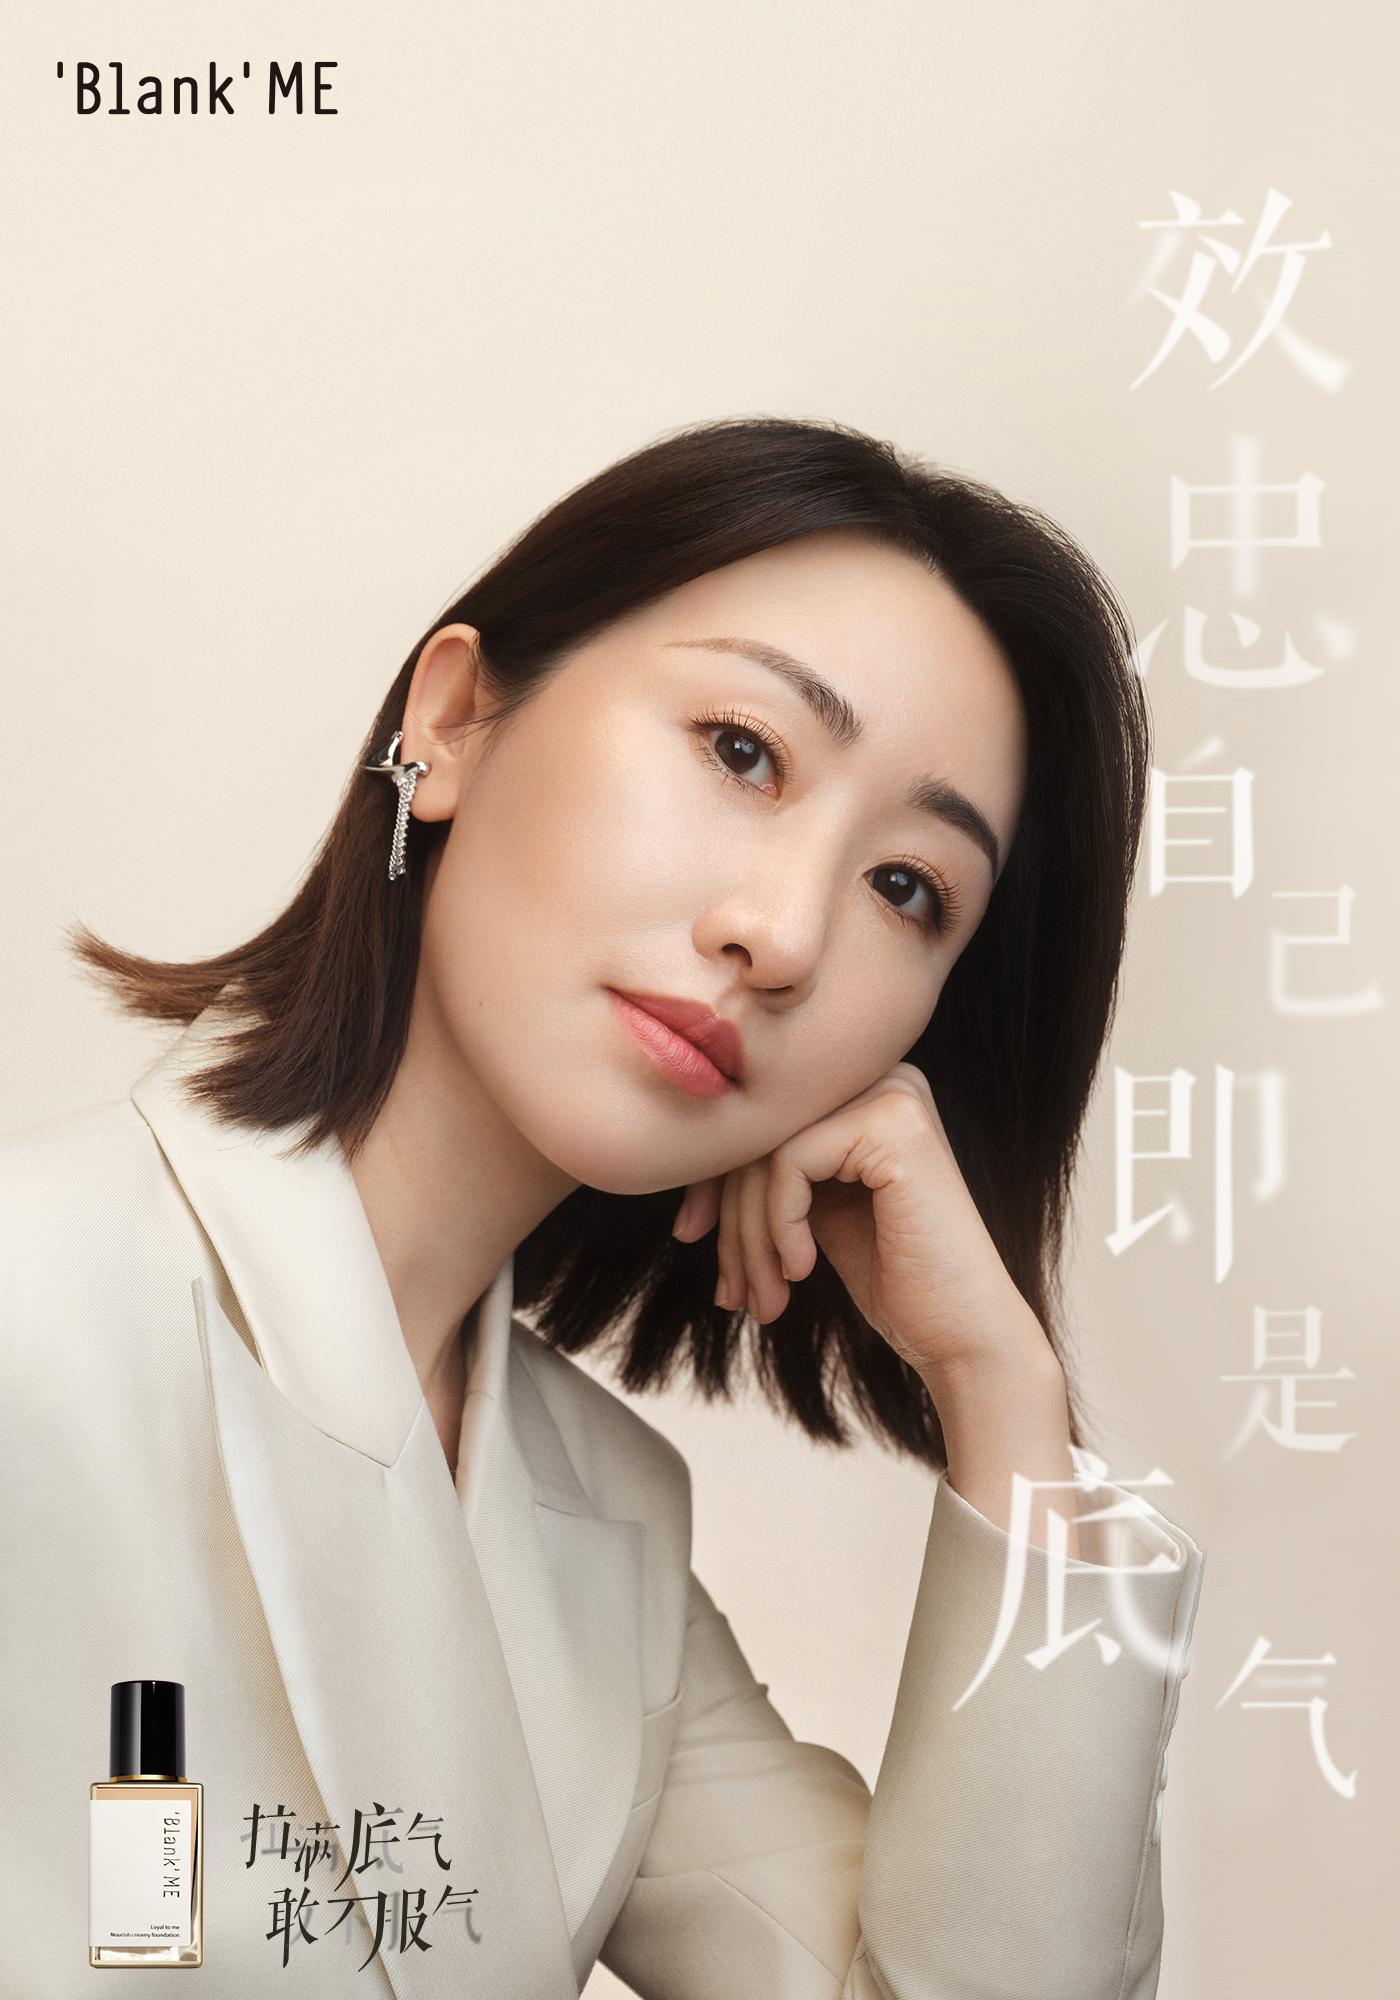 "Blank ME全新演绎自信""底气"",为亚洲女性加持底妆安全感"